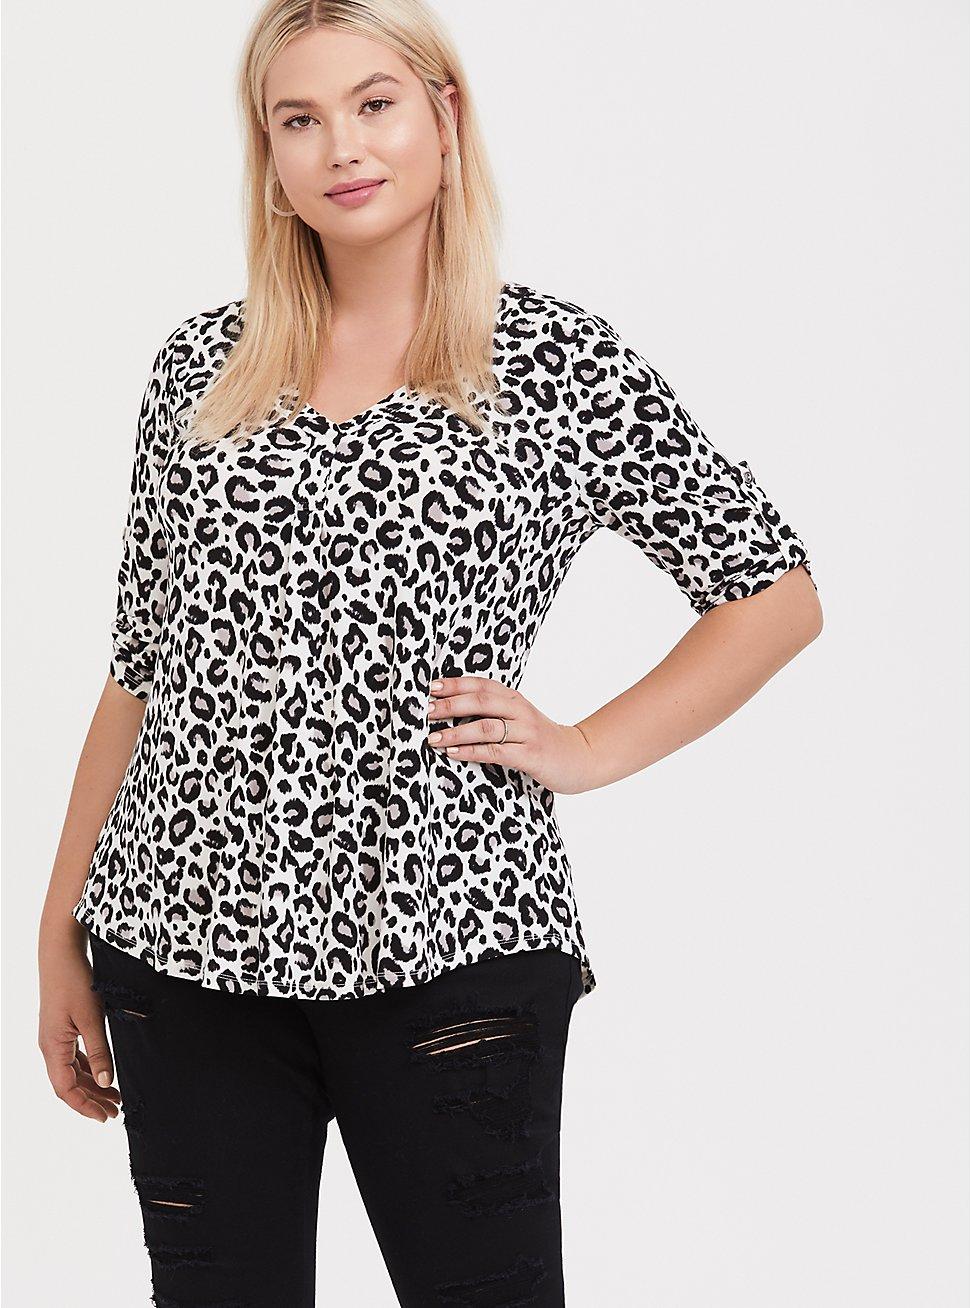 Harper - Leopard Print Studio Knit Blouse, , hi-res